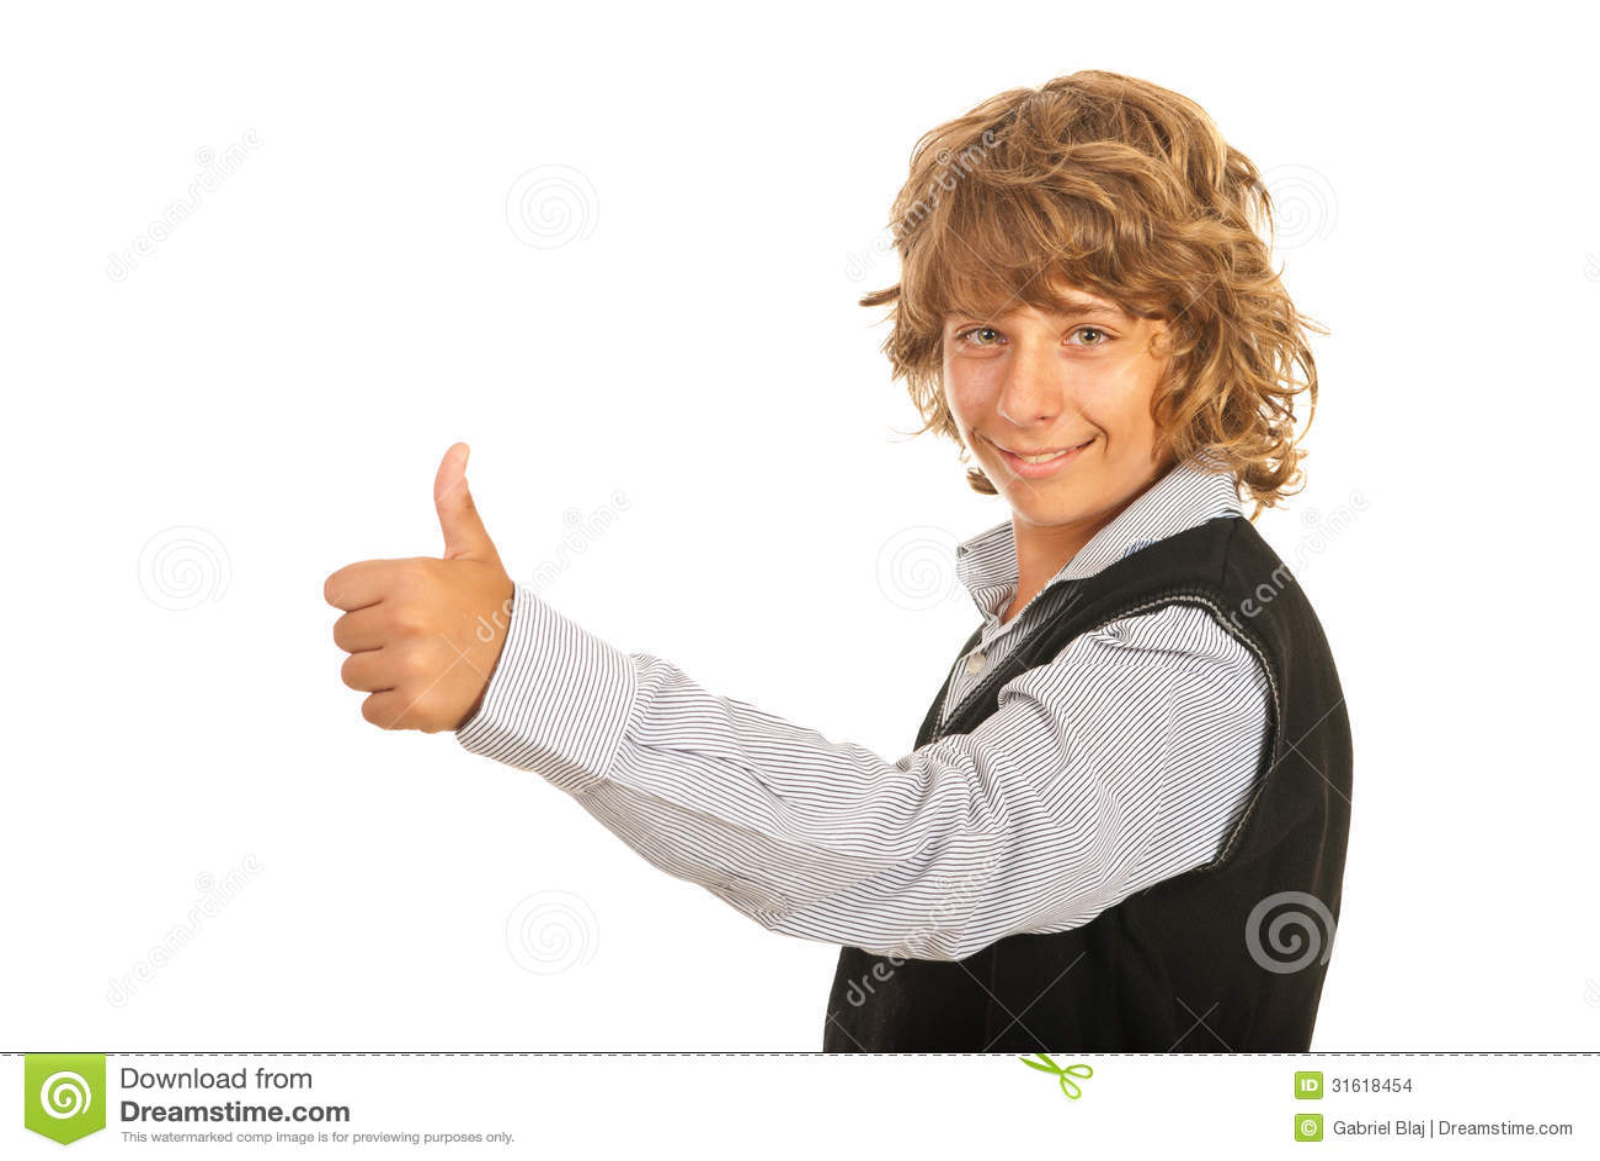 Successful Teen 31